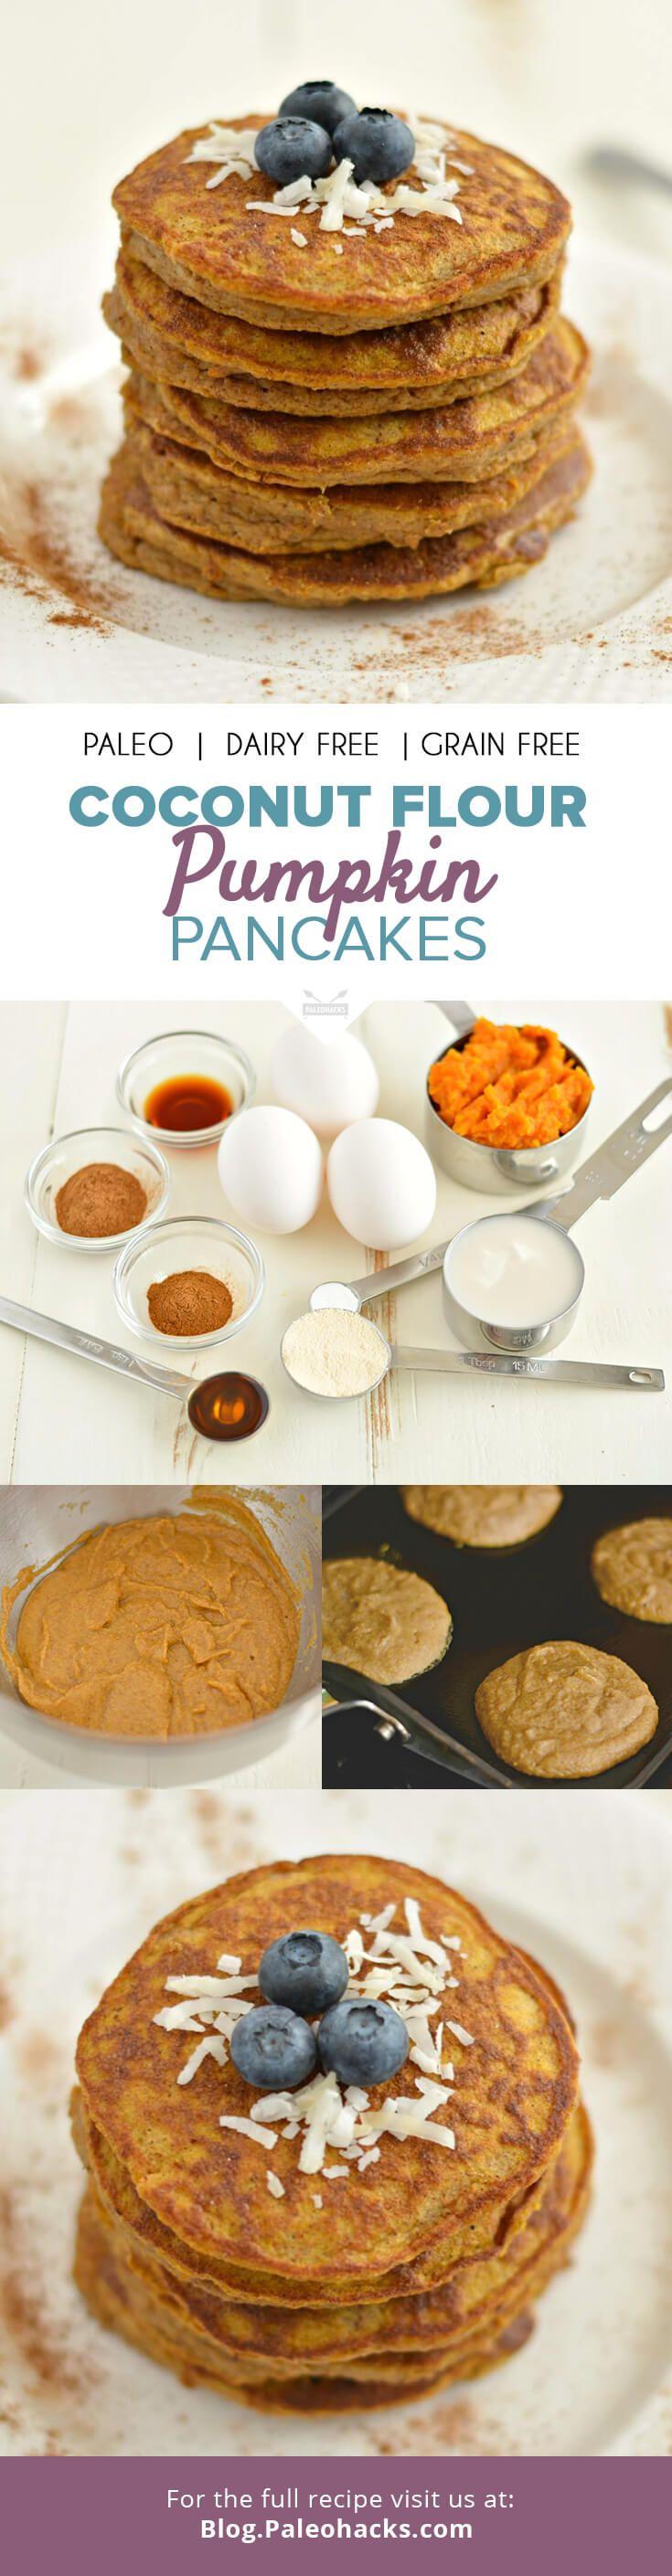 Coconut Flour Pumpkin Pancakes #justeatrealfood #paleohacks